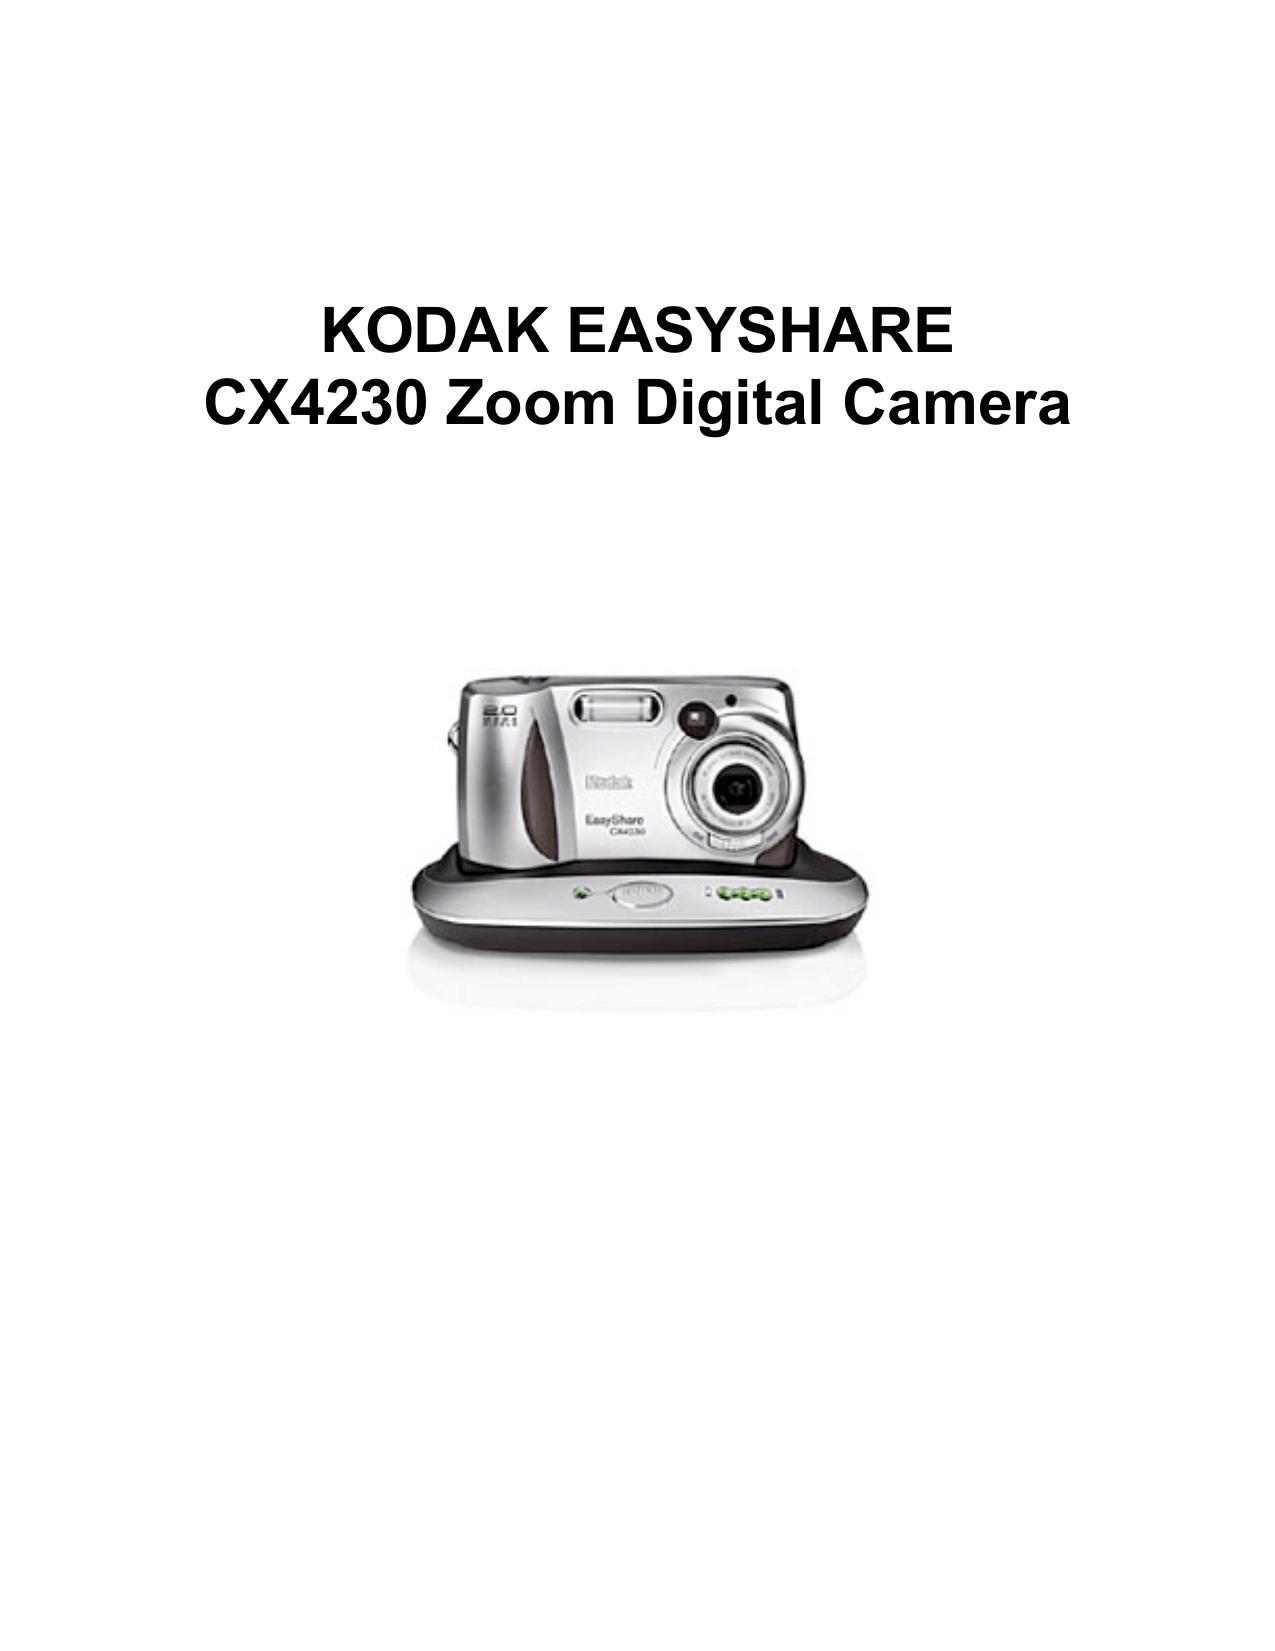 PDF manual for Kodak Digital Camera EasyShare CX4230